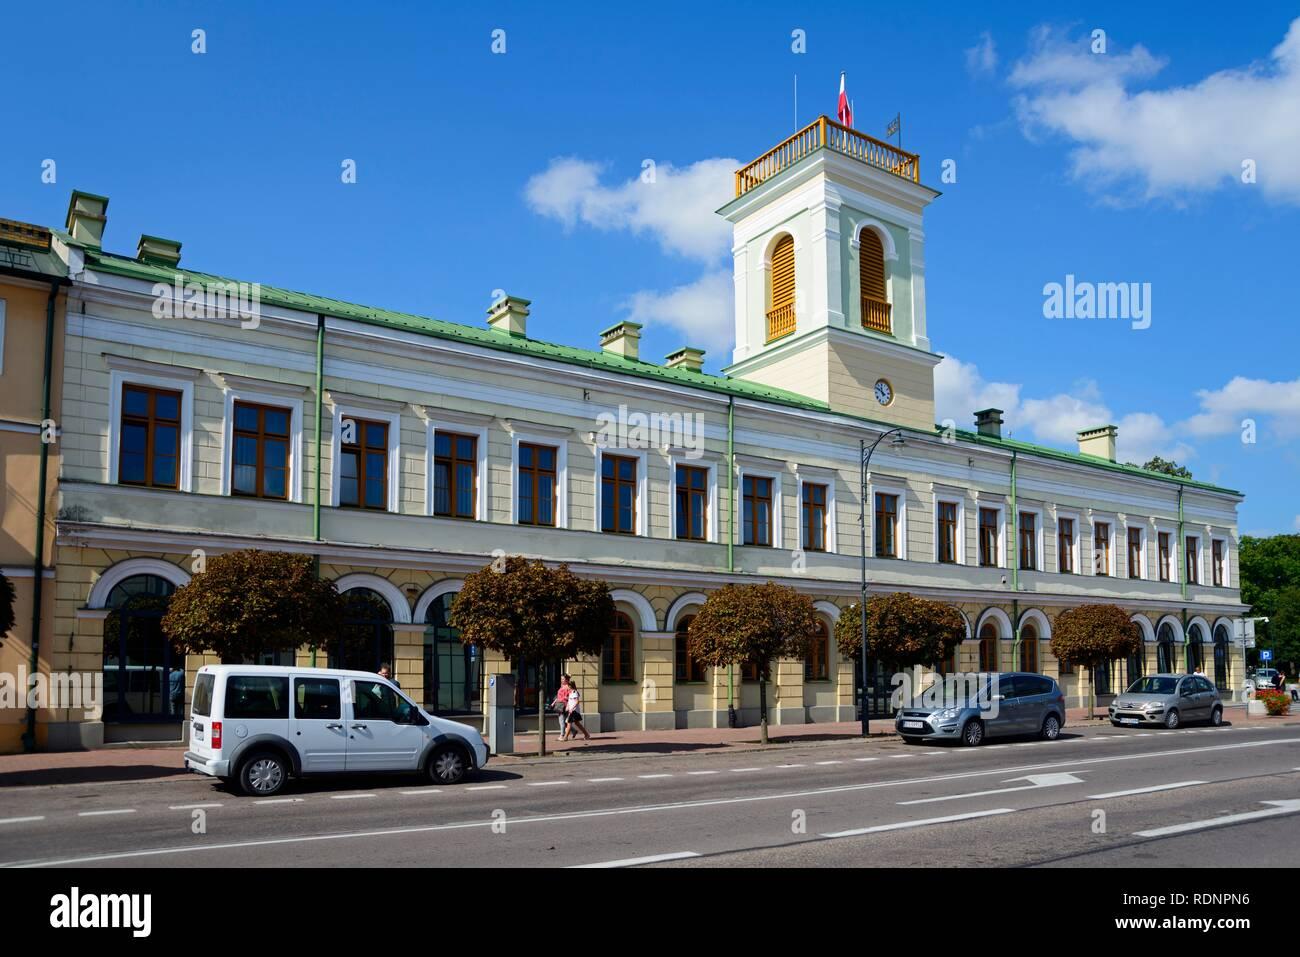 City Hall, Suwalki, Podlaskie, Poland - Stock Image